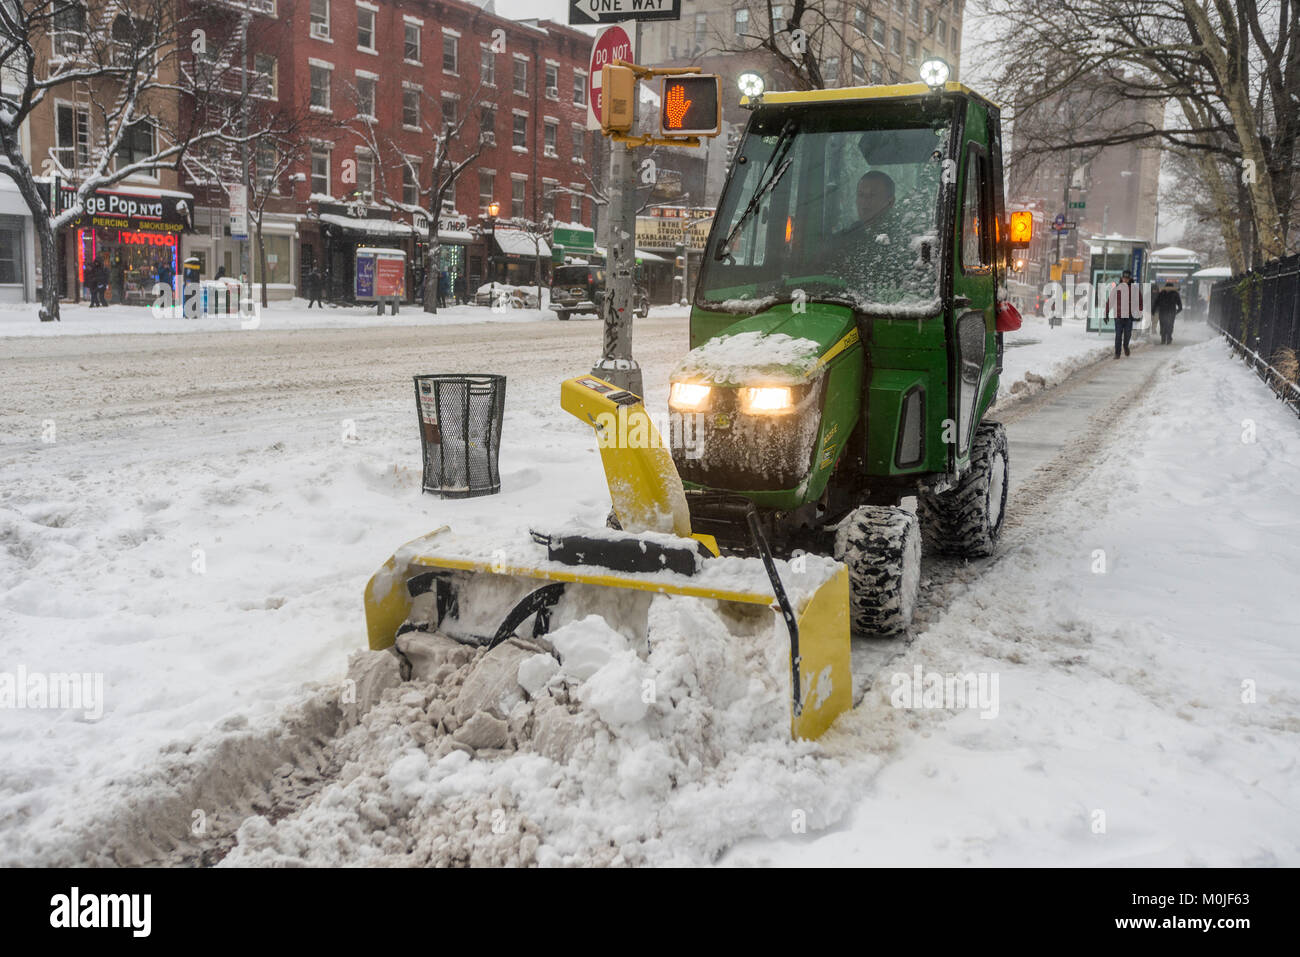 New York, NY, 4. Januar 2018 - ein Park-abteilung Lkw löscht den ...